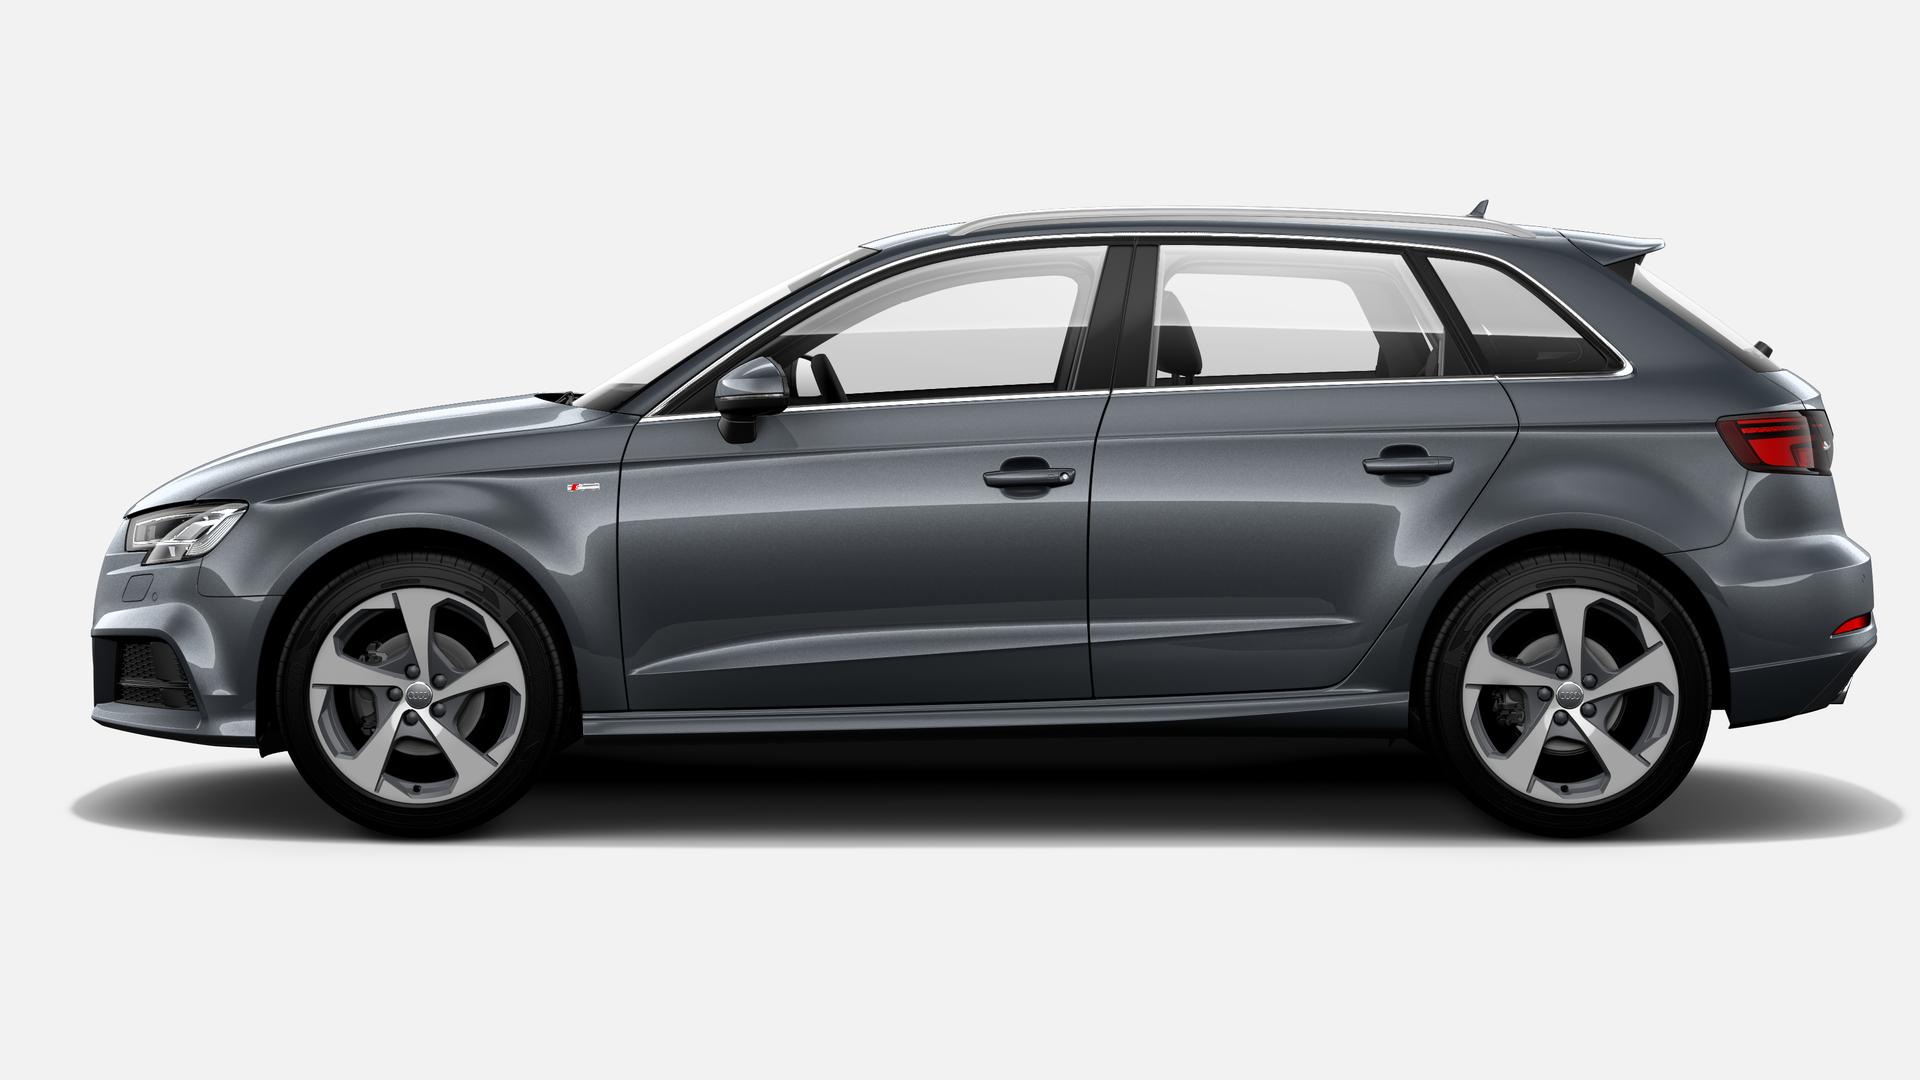 Vista Lateral izquierda de Audi A3 Sportback 35 TFSI CoD S line 110 kW (150 CV)